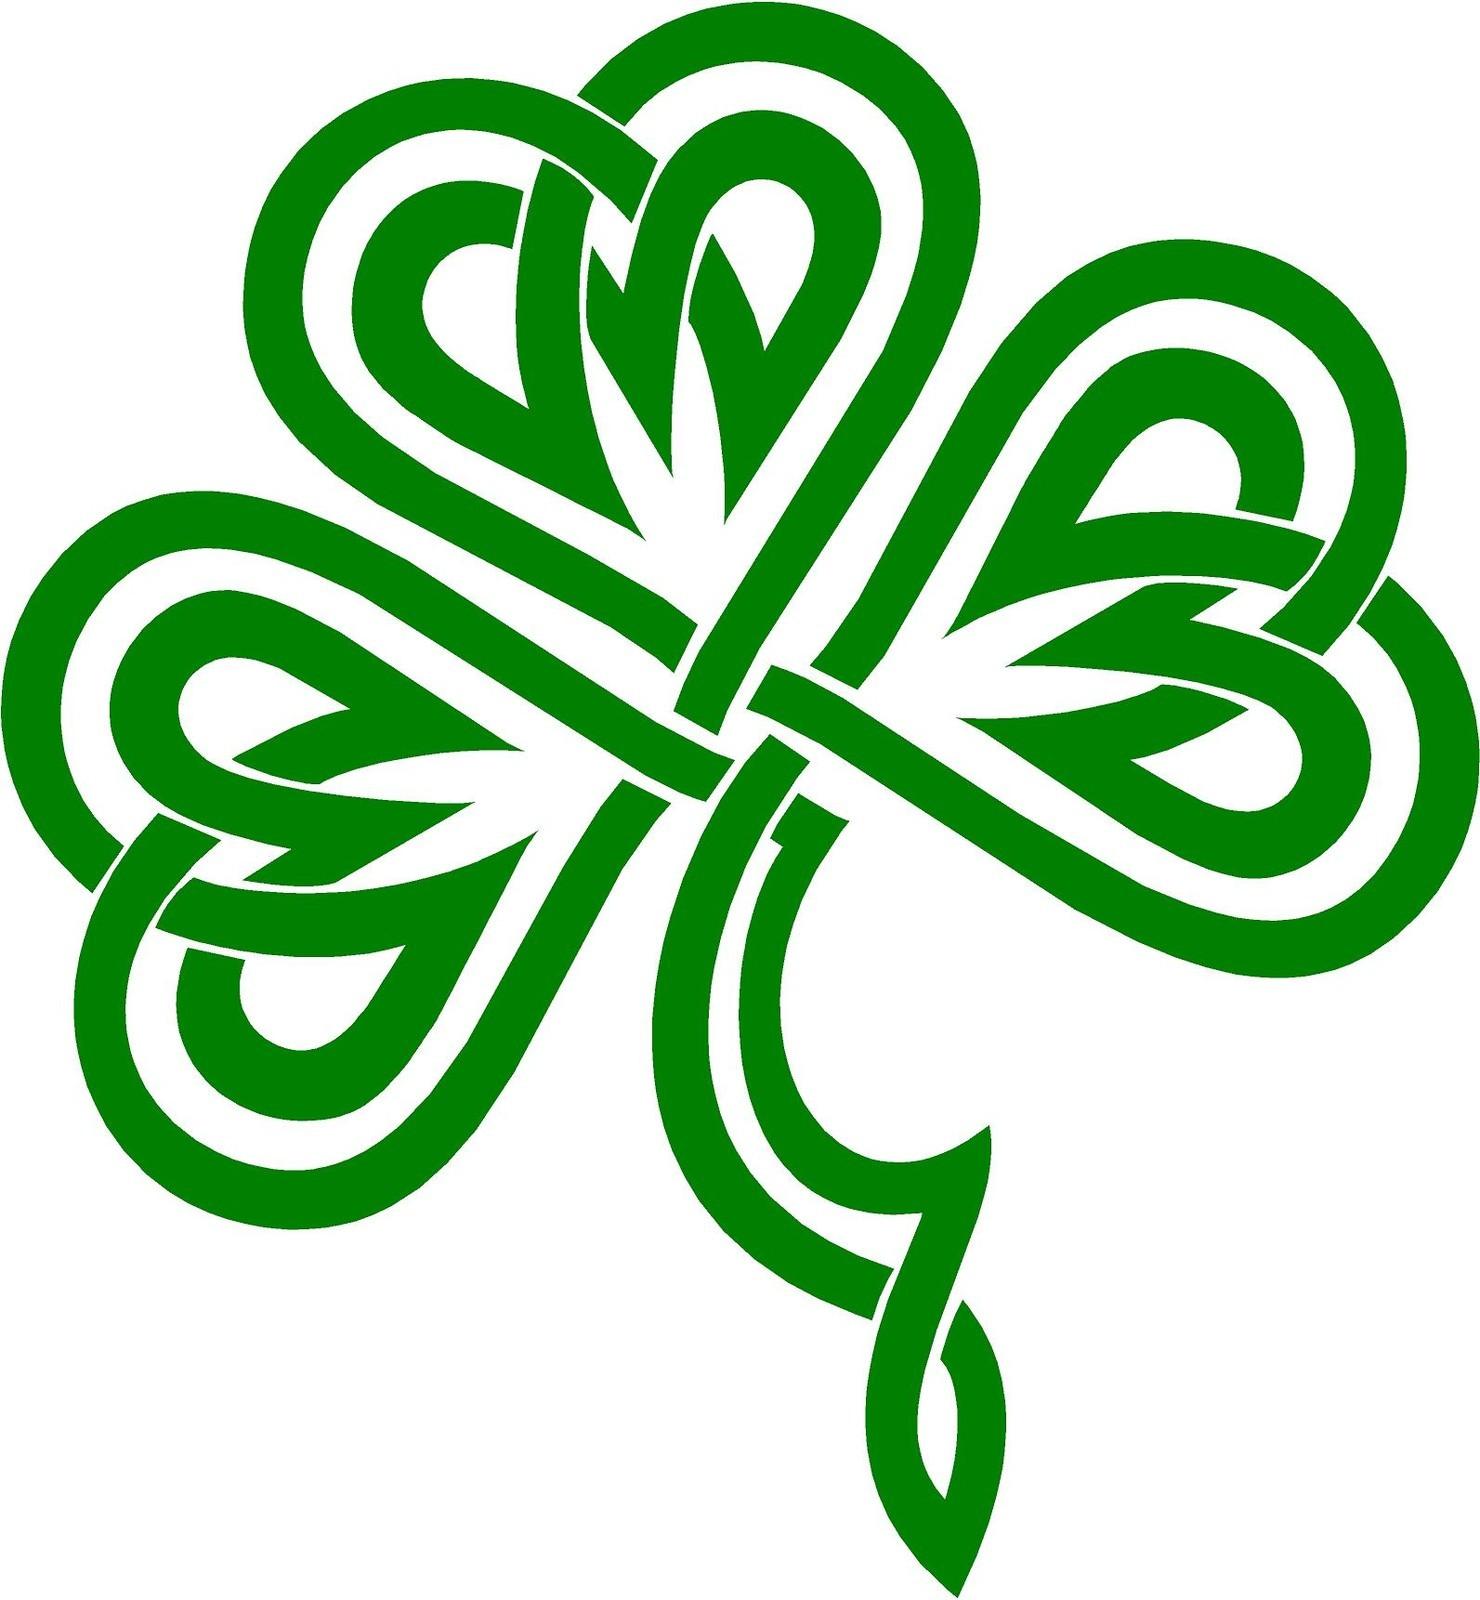 Celtic clipart Celtic clipart Celtic Art ClipartAndScrap